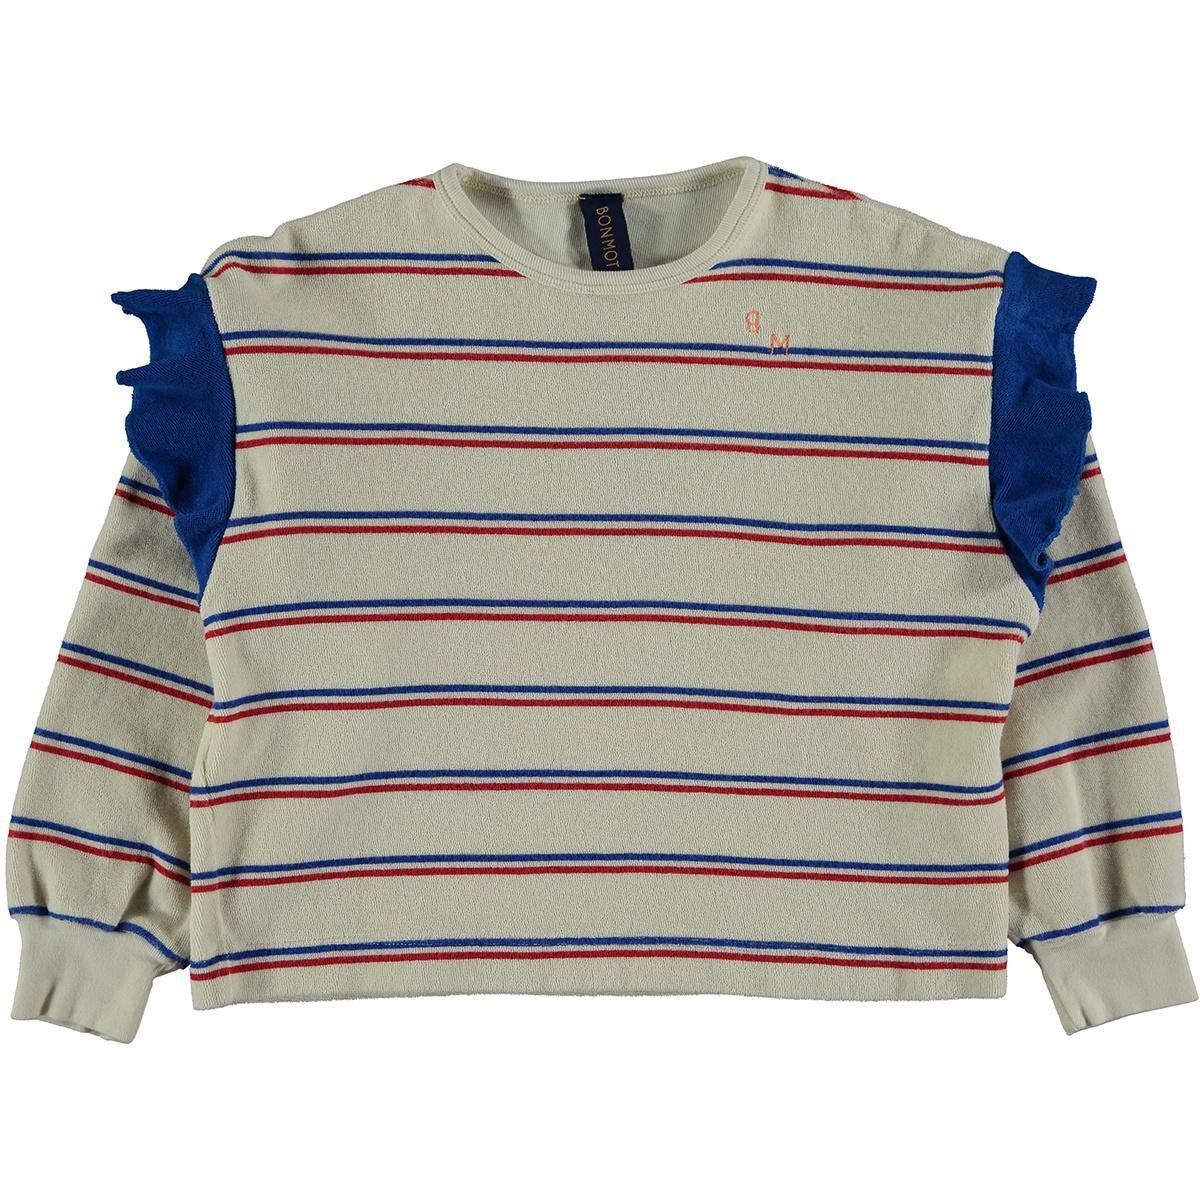 Sweatshirt kid Frill - Ivory-1